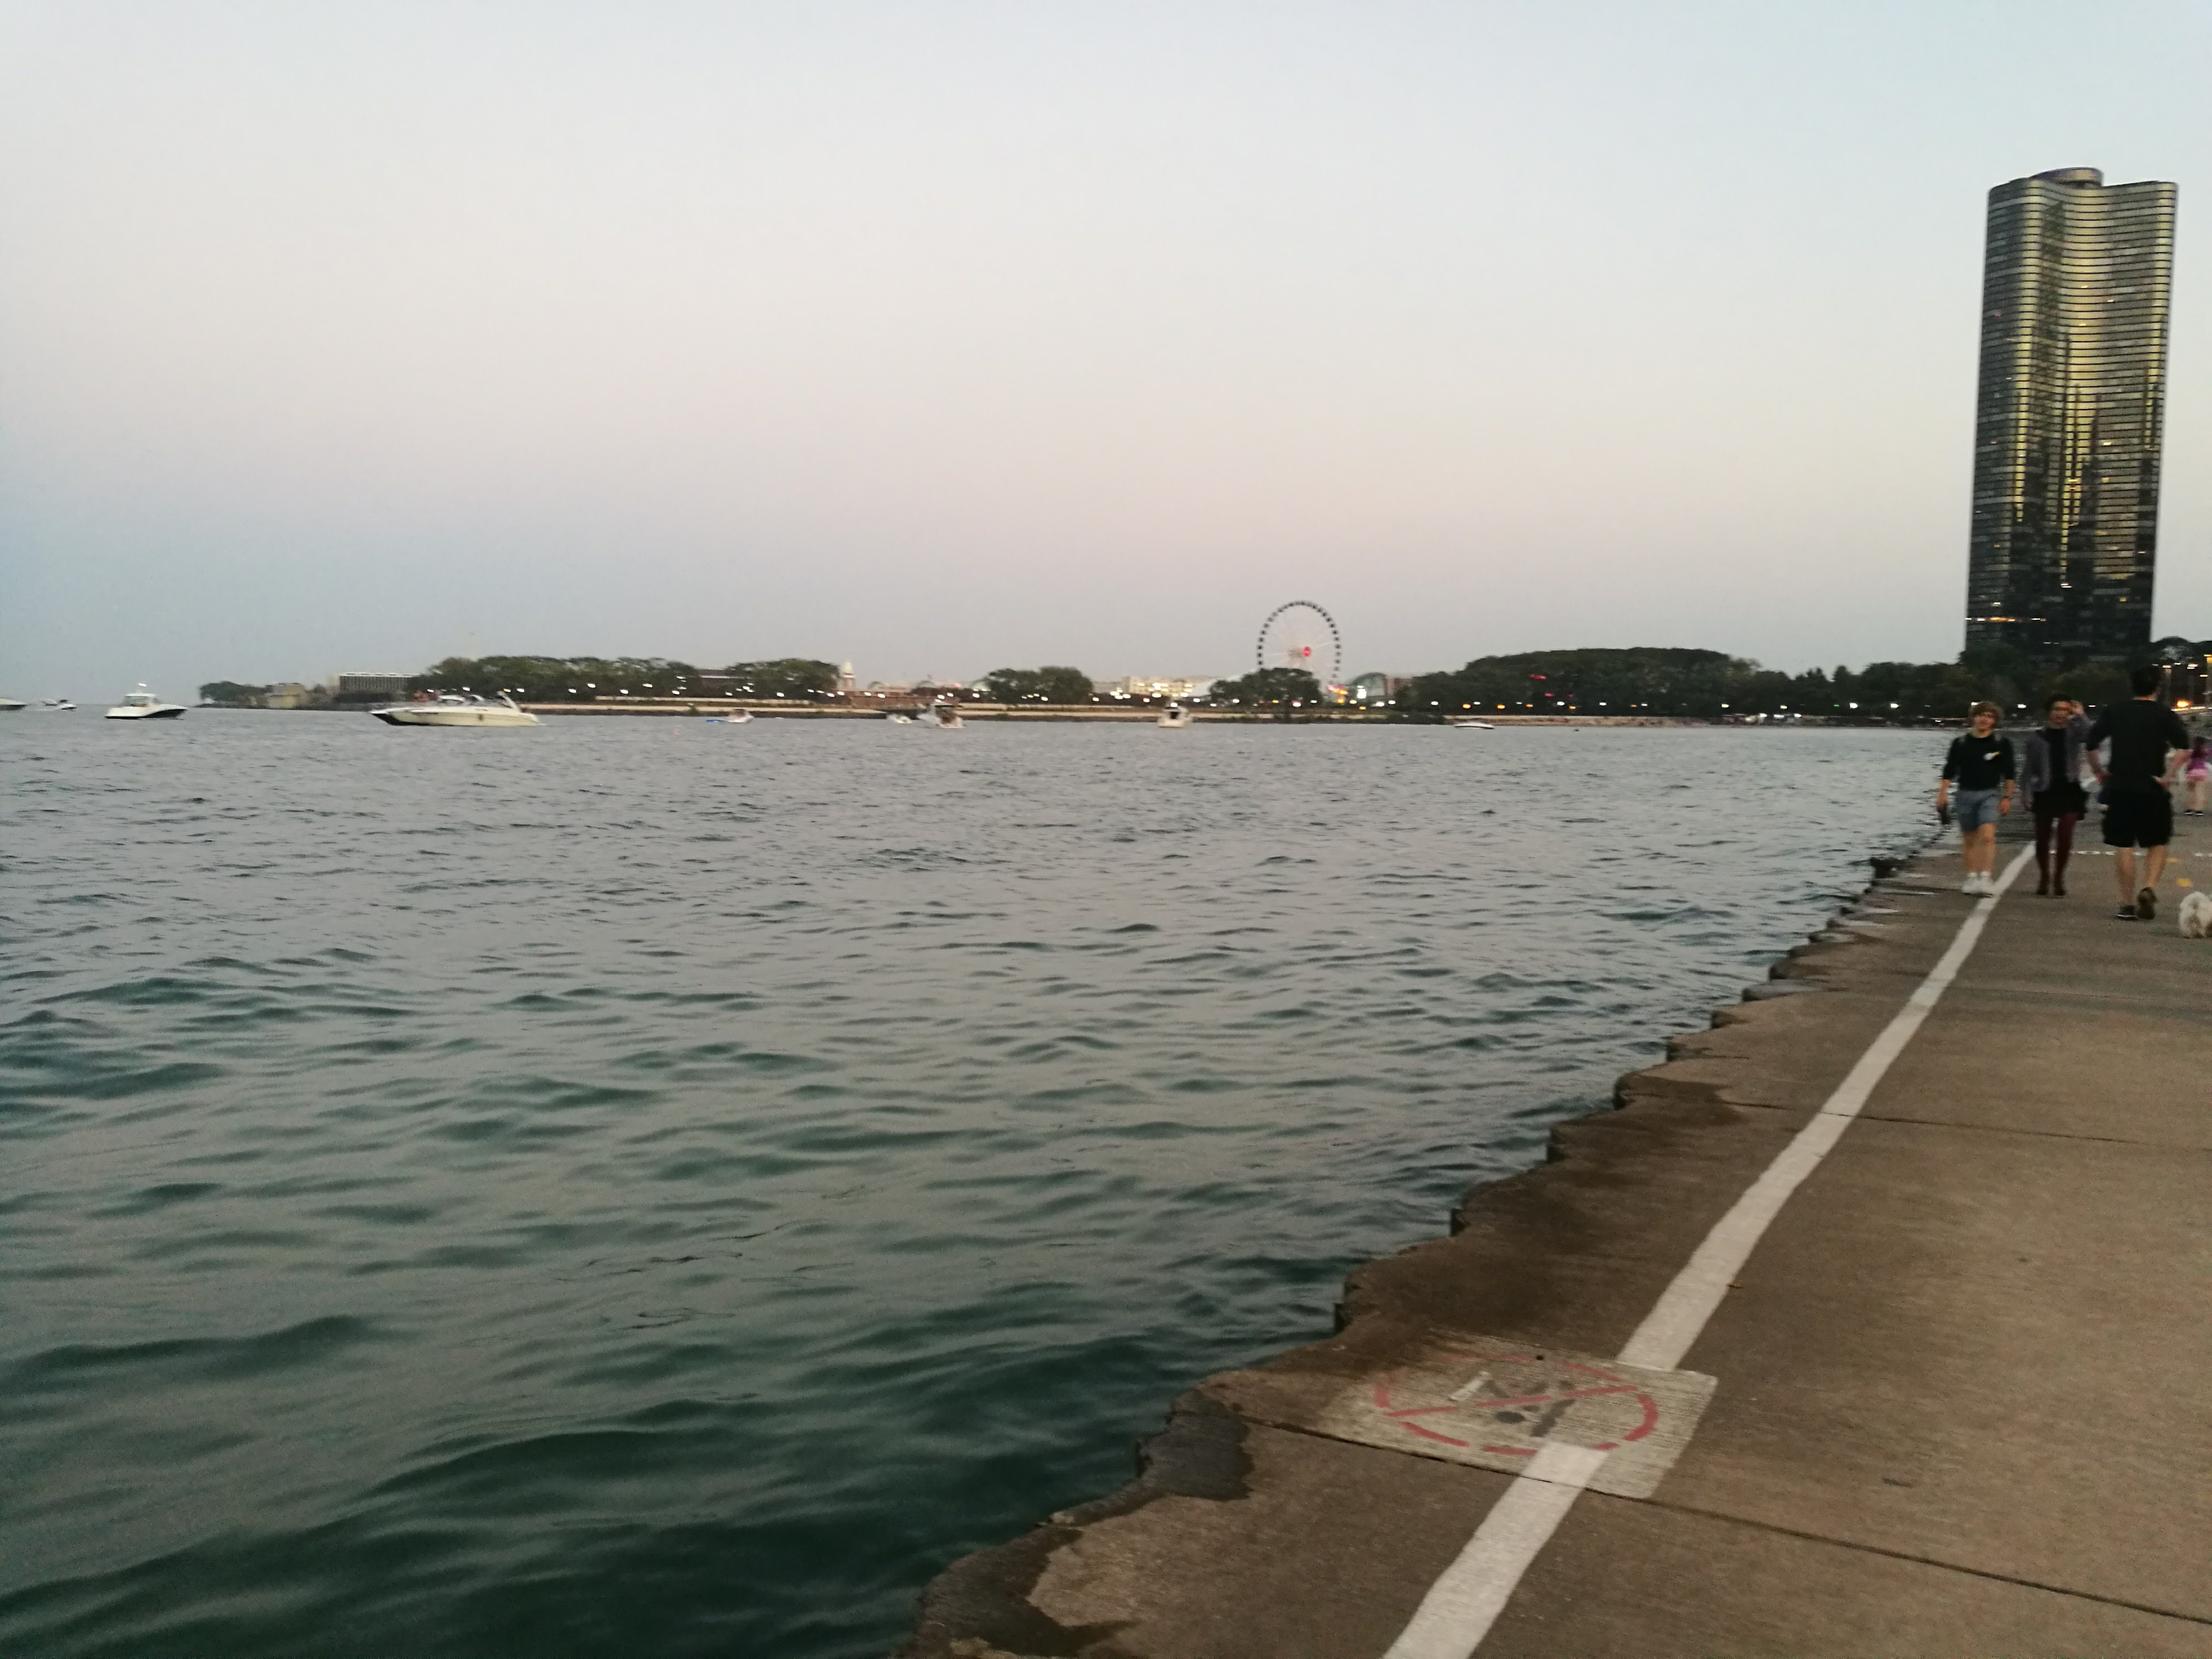 walking along Lake Shore Drive in Chicago